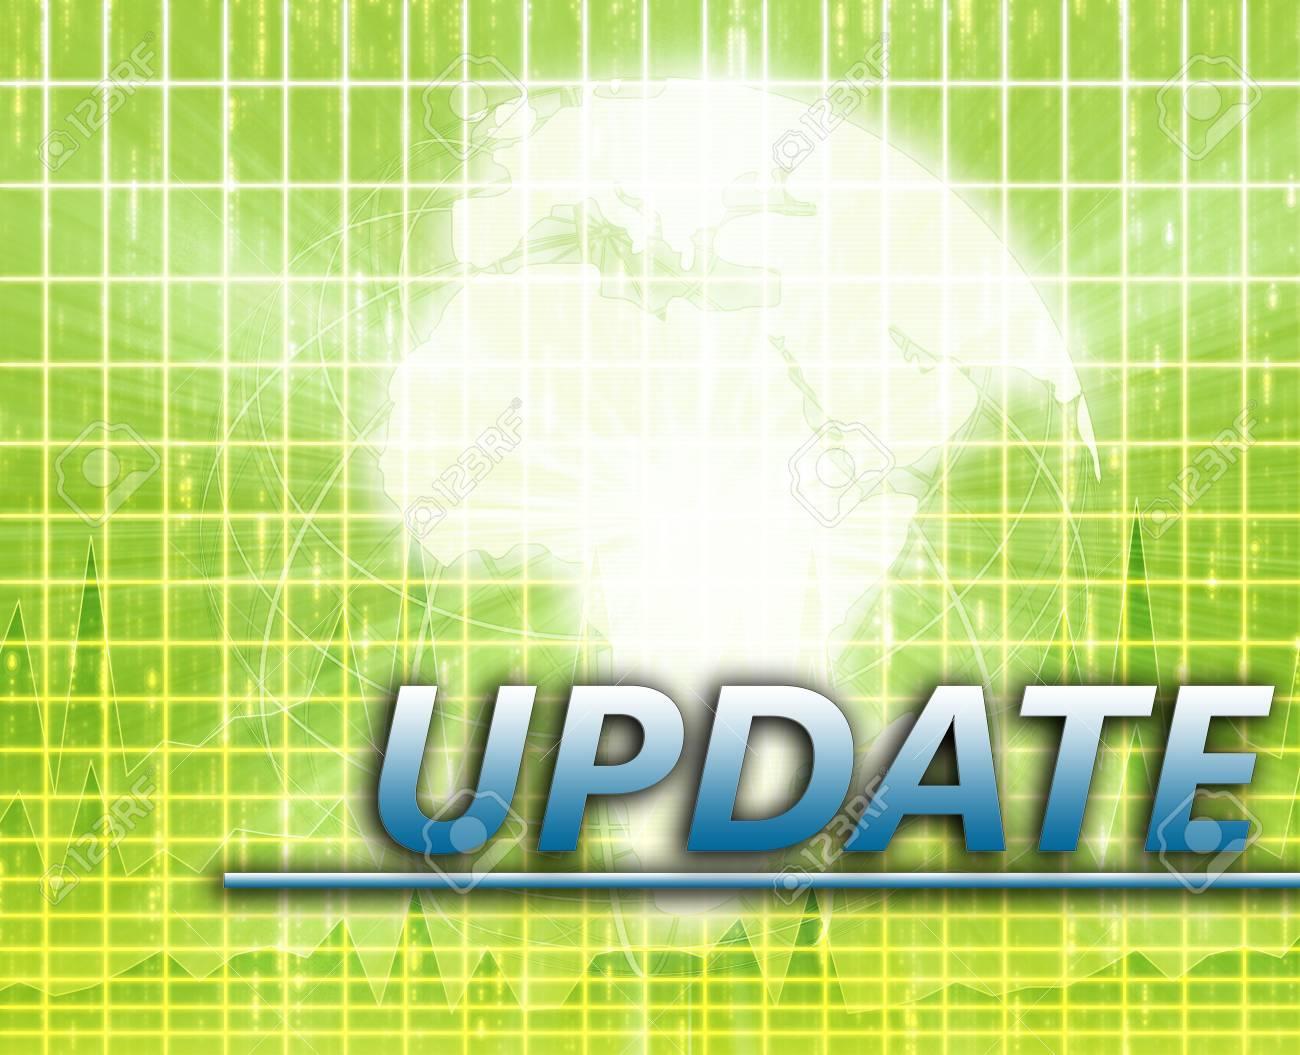 Africa Latest update news newsflash splash screen announcement illustration Stock Photo - 6314593